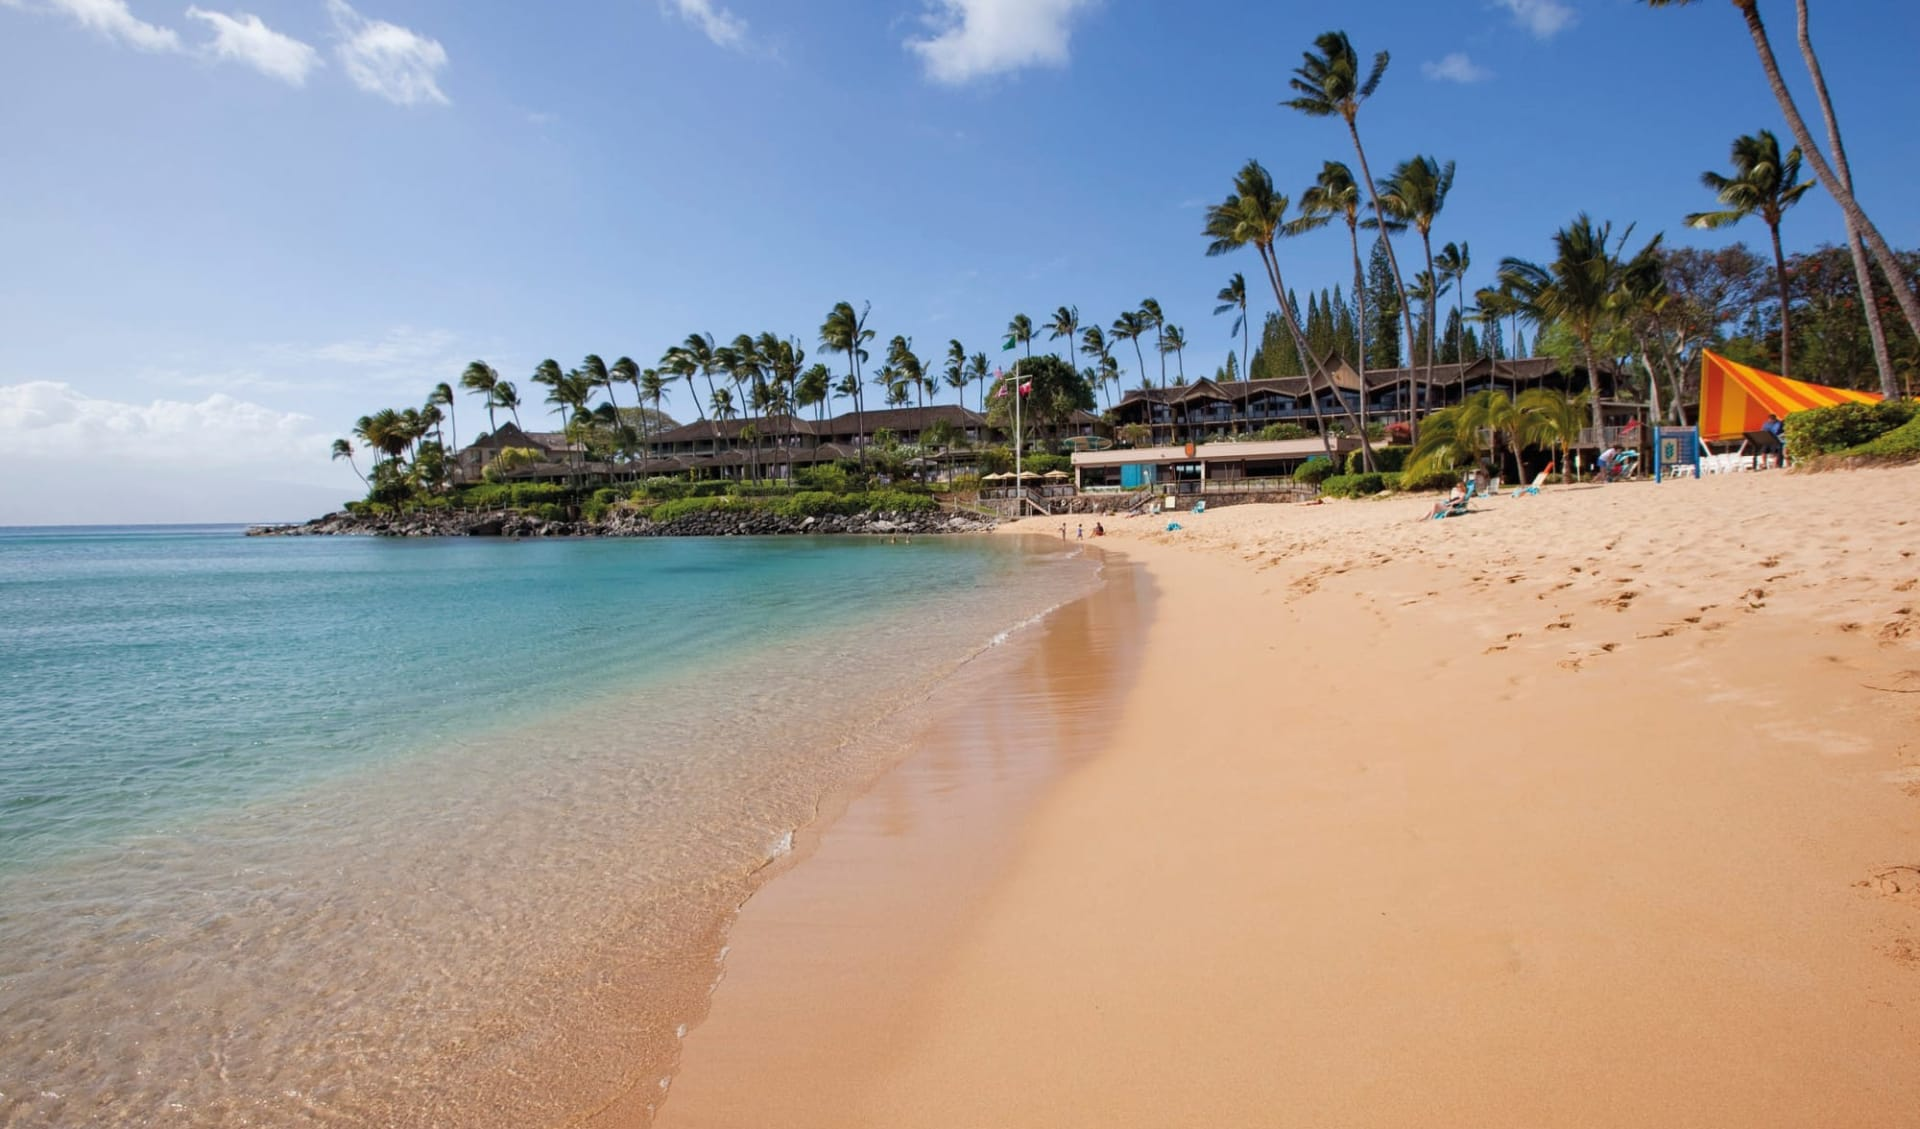 Napili Kai Beach Resort in Napili - Maui: Napili Kai Beach Resort - Aussenansicht